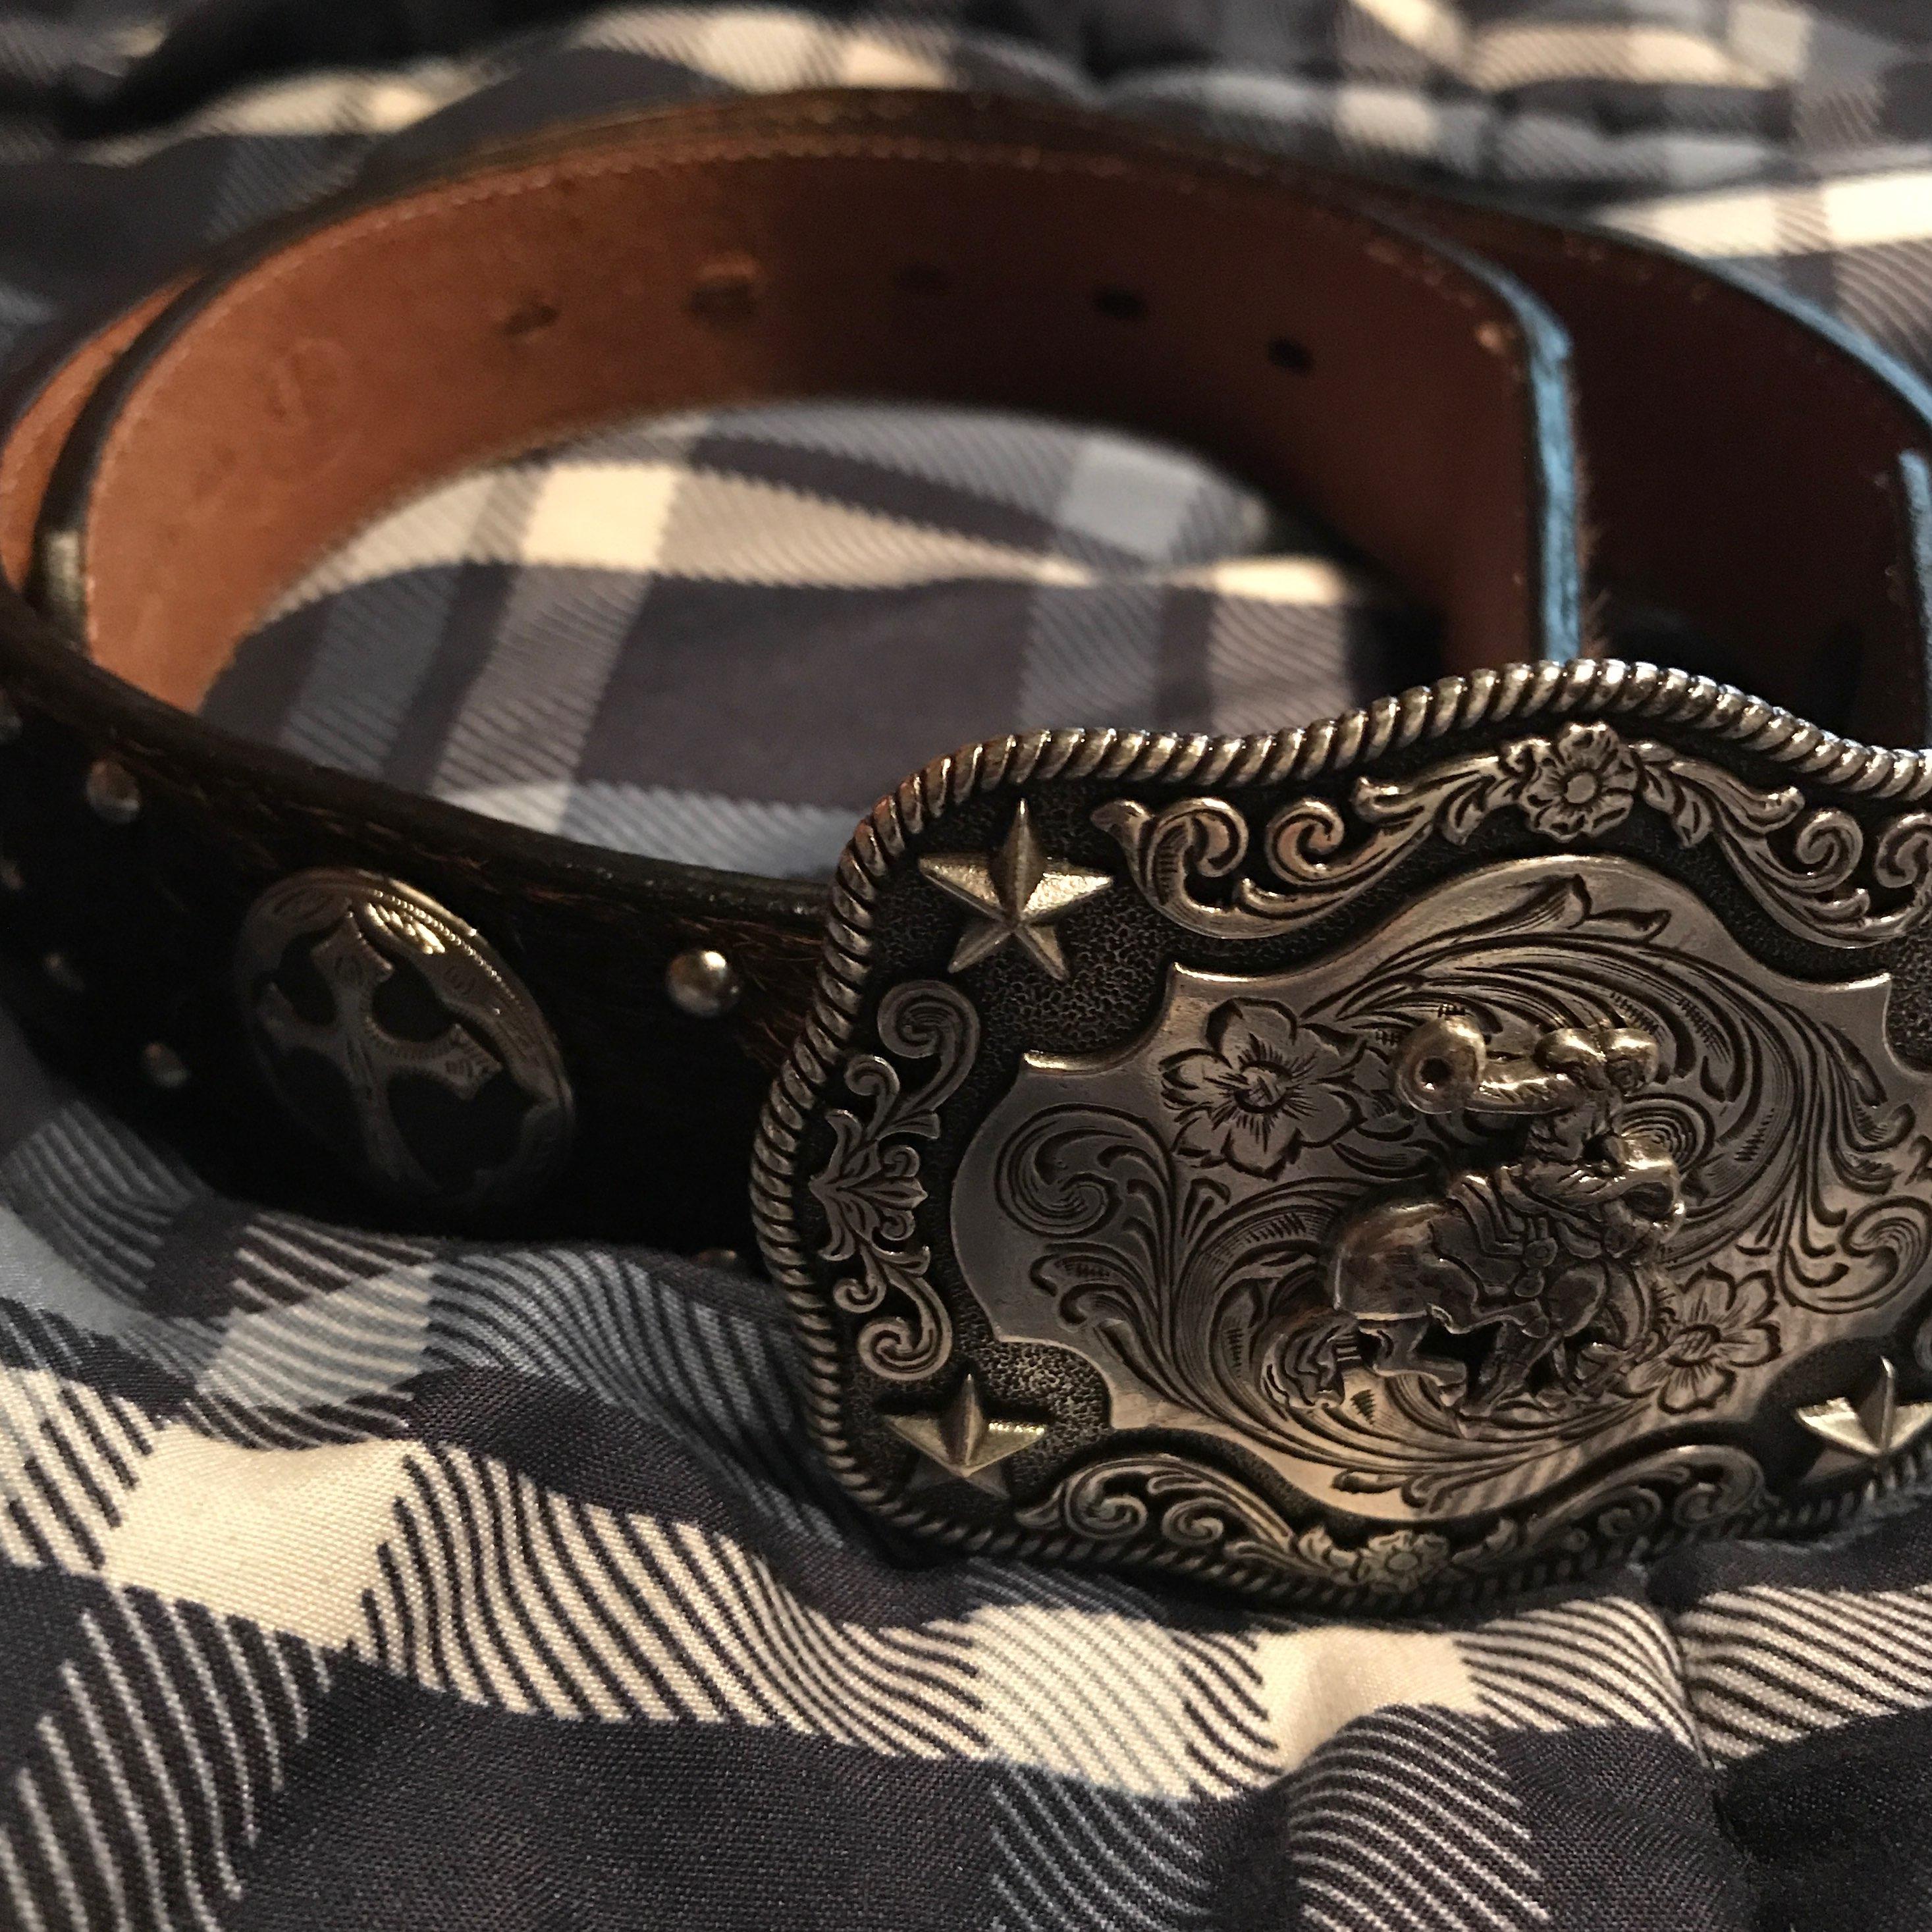 Belt with big buckle